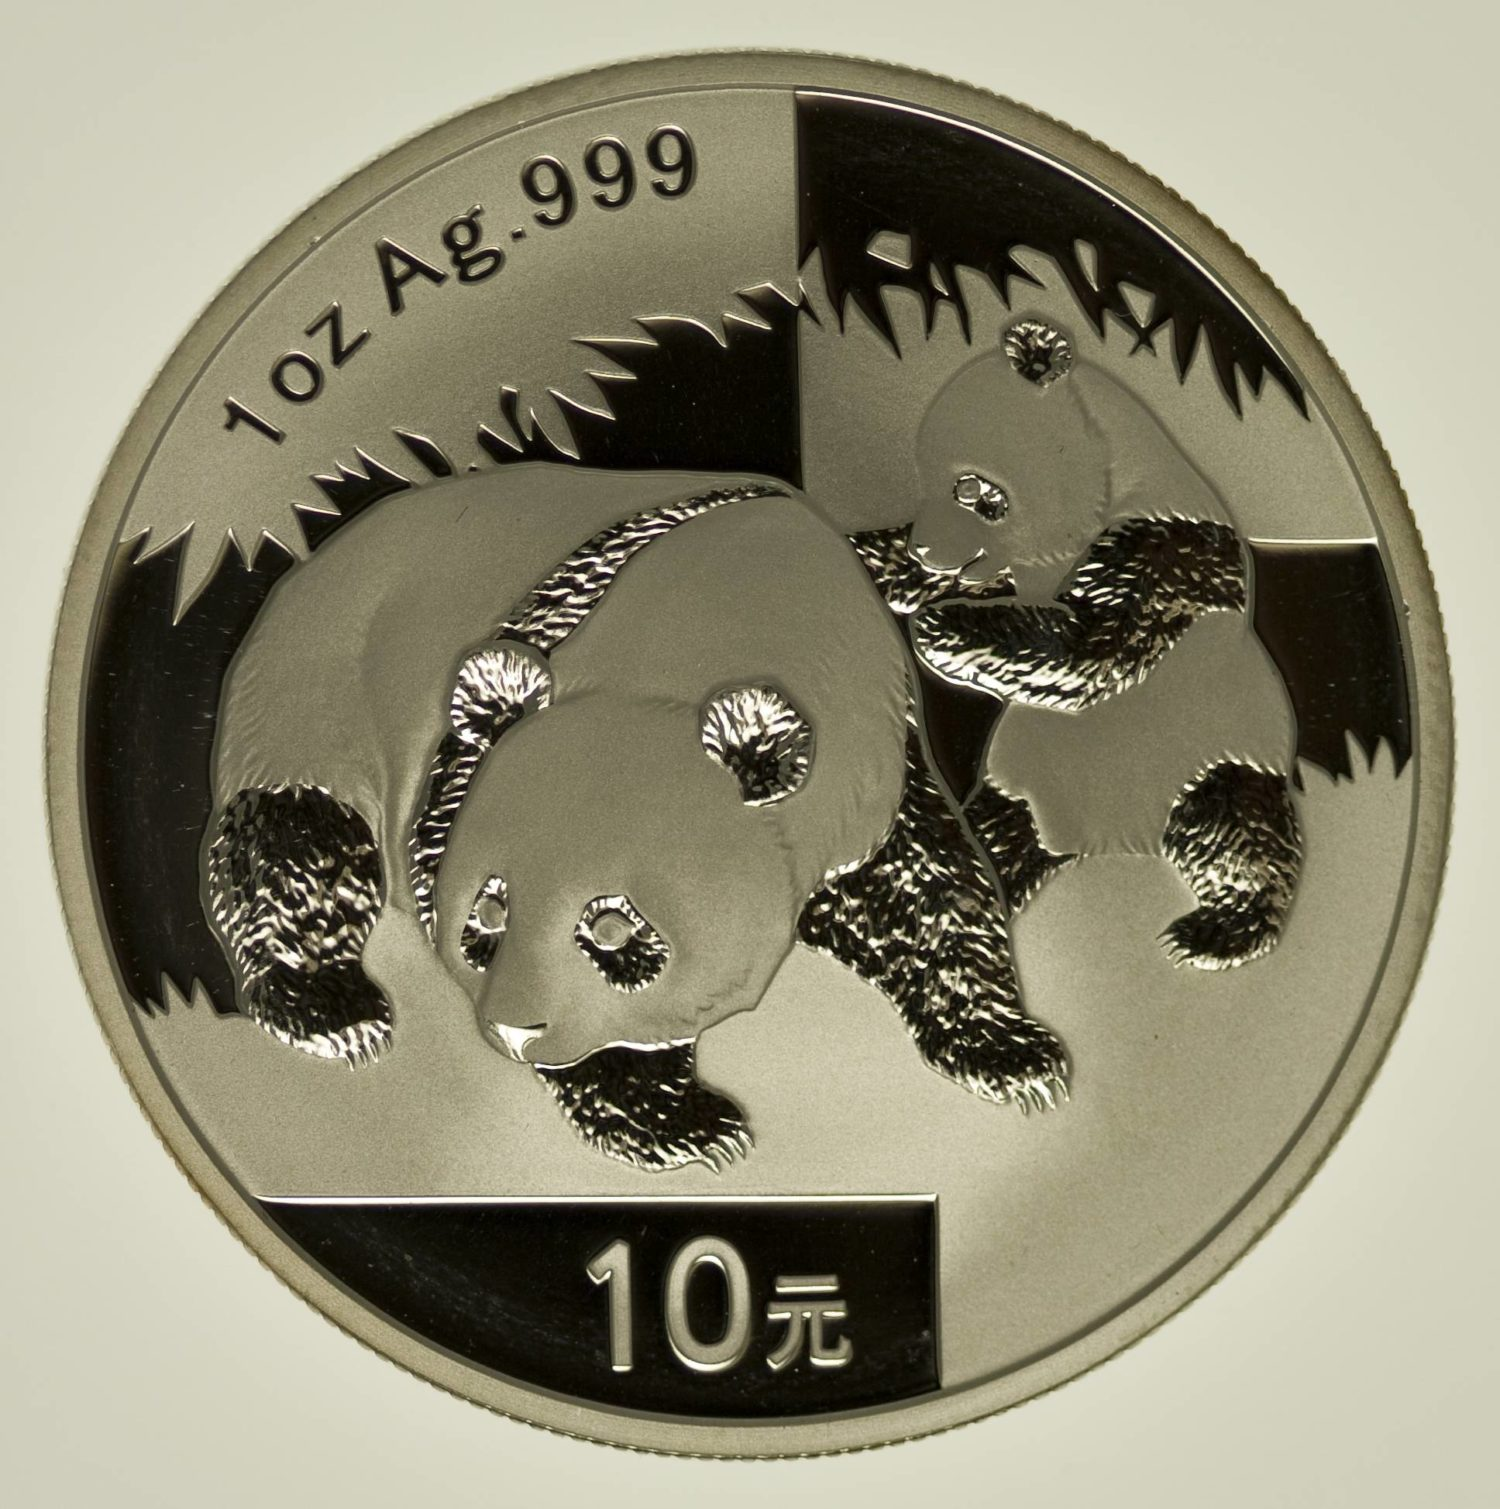 1 Unze Silbermünze China Panda 2008 10 Yuan 31,1 Gramm Silber RAR